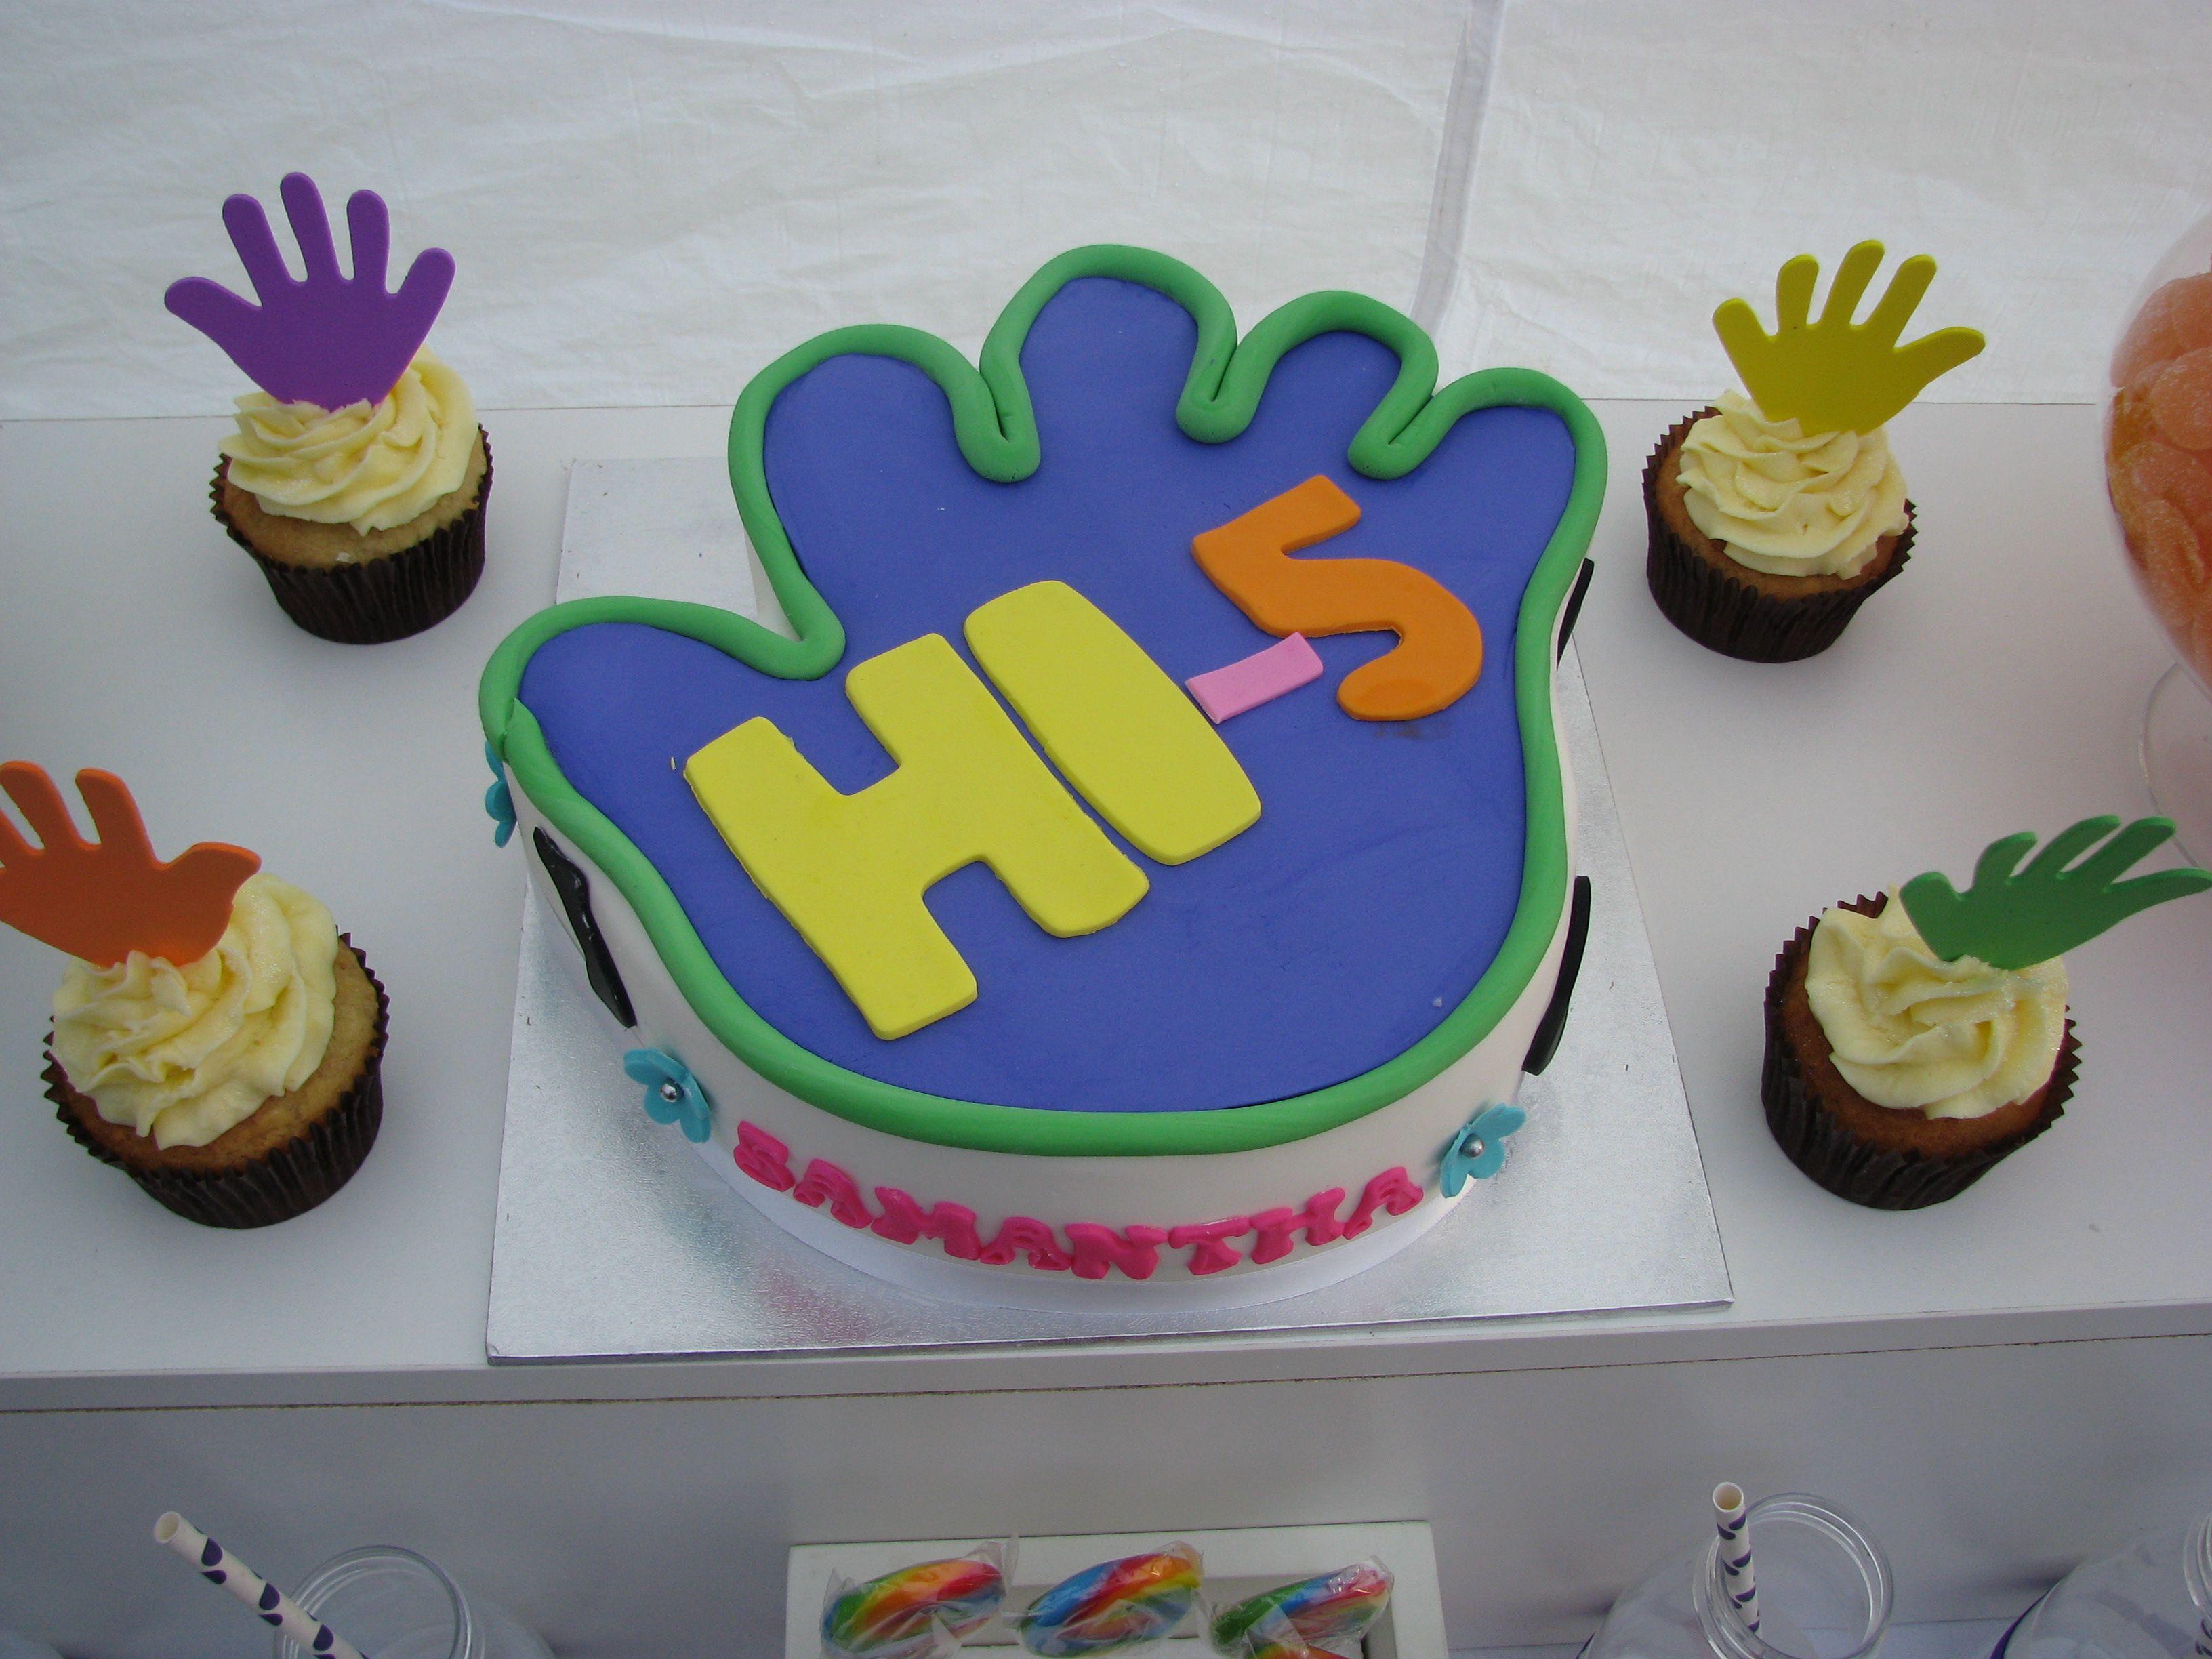 Hi 5 Cake Year Old Birthday Theme